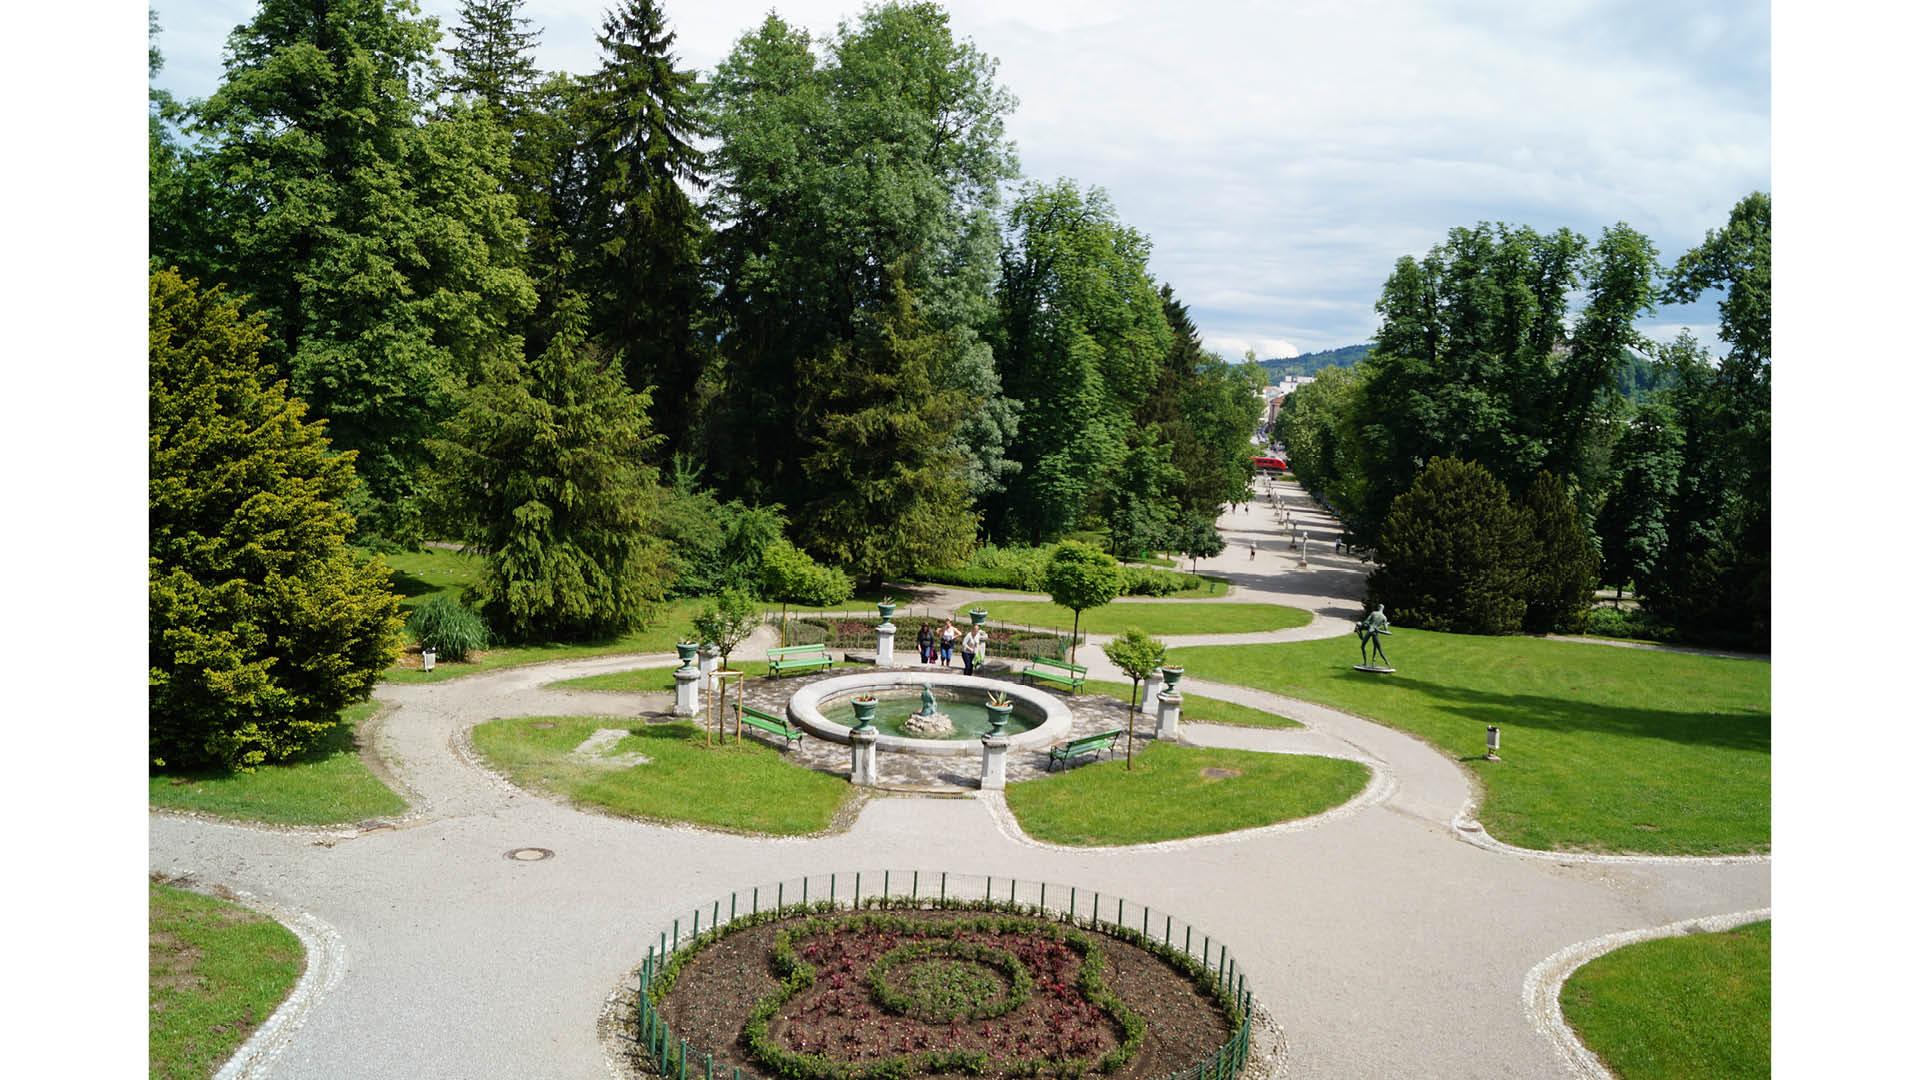 Kompaktsminar Ljubljana 2018 13